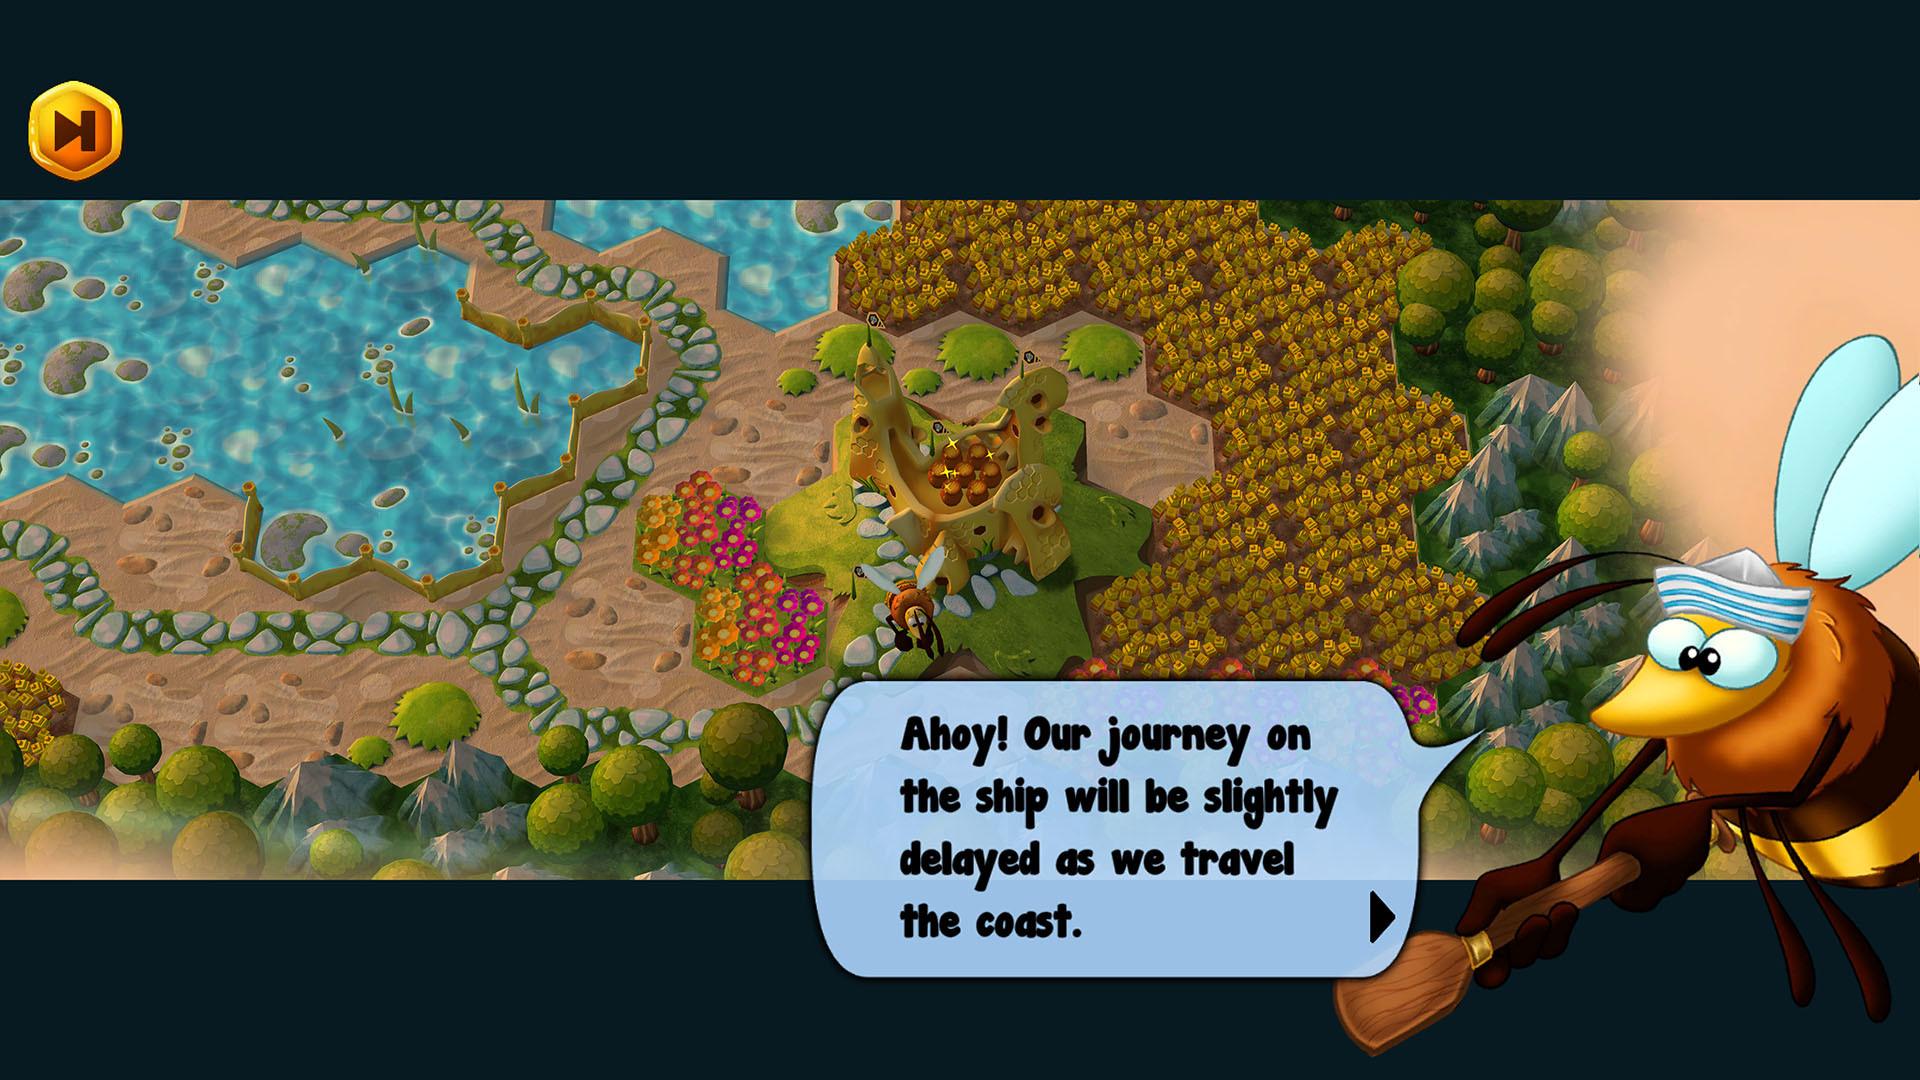 Dialog Sailor_english.jpg